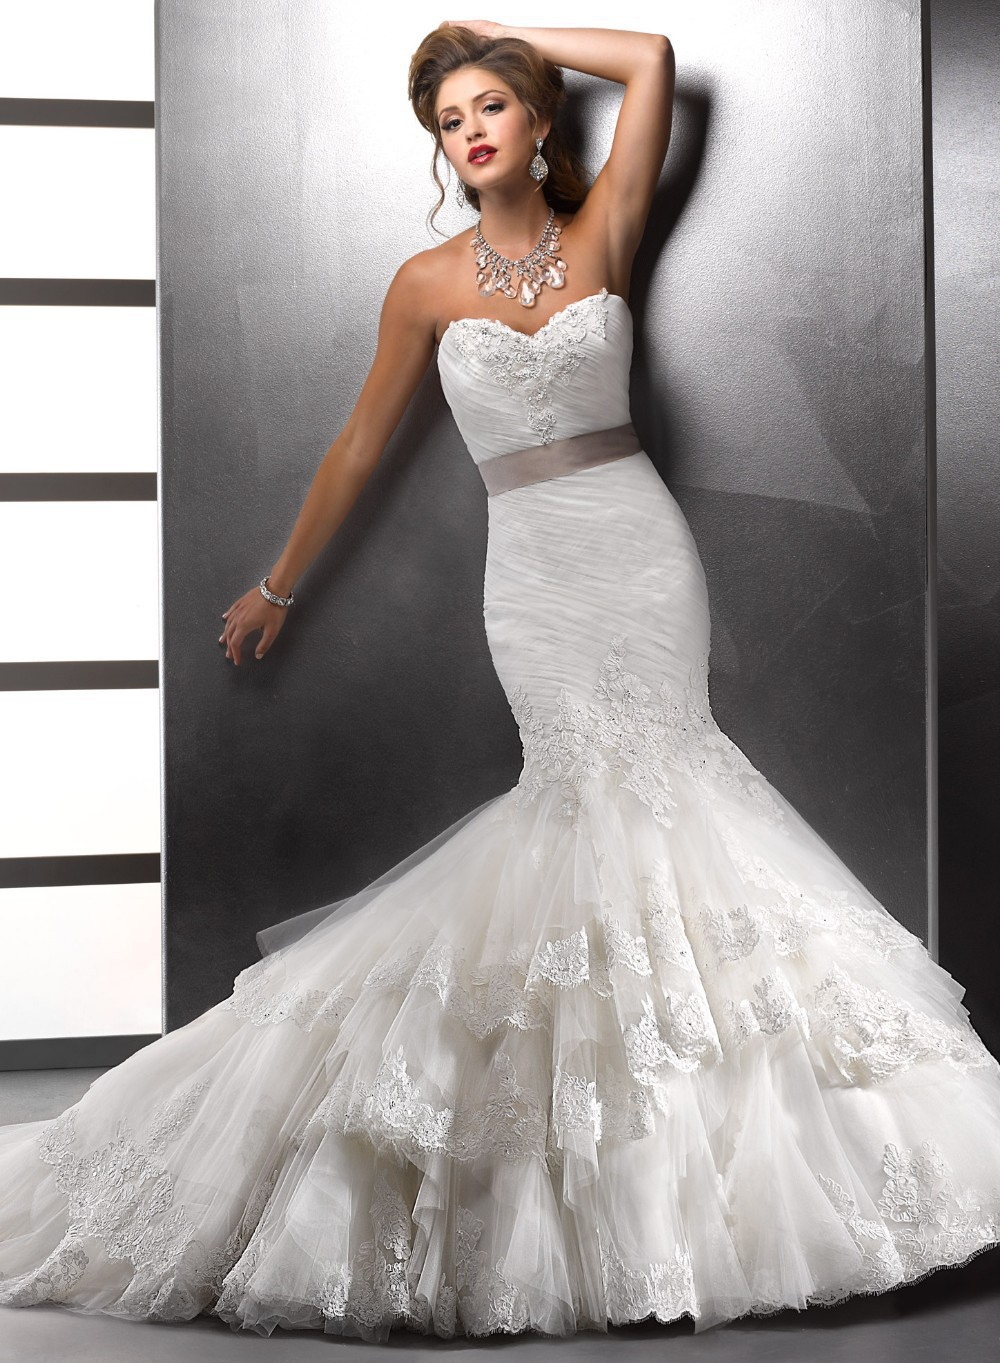 Aliexpress.com : Buy 2017 Lace Sweetheart Mermaid Wedding Dresses ...